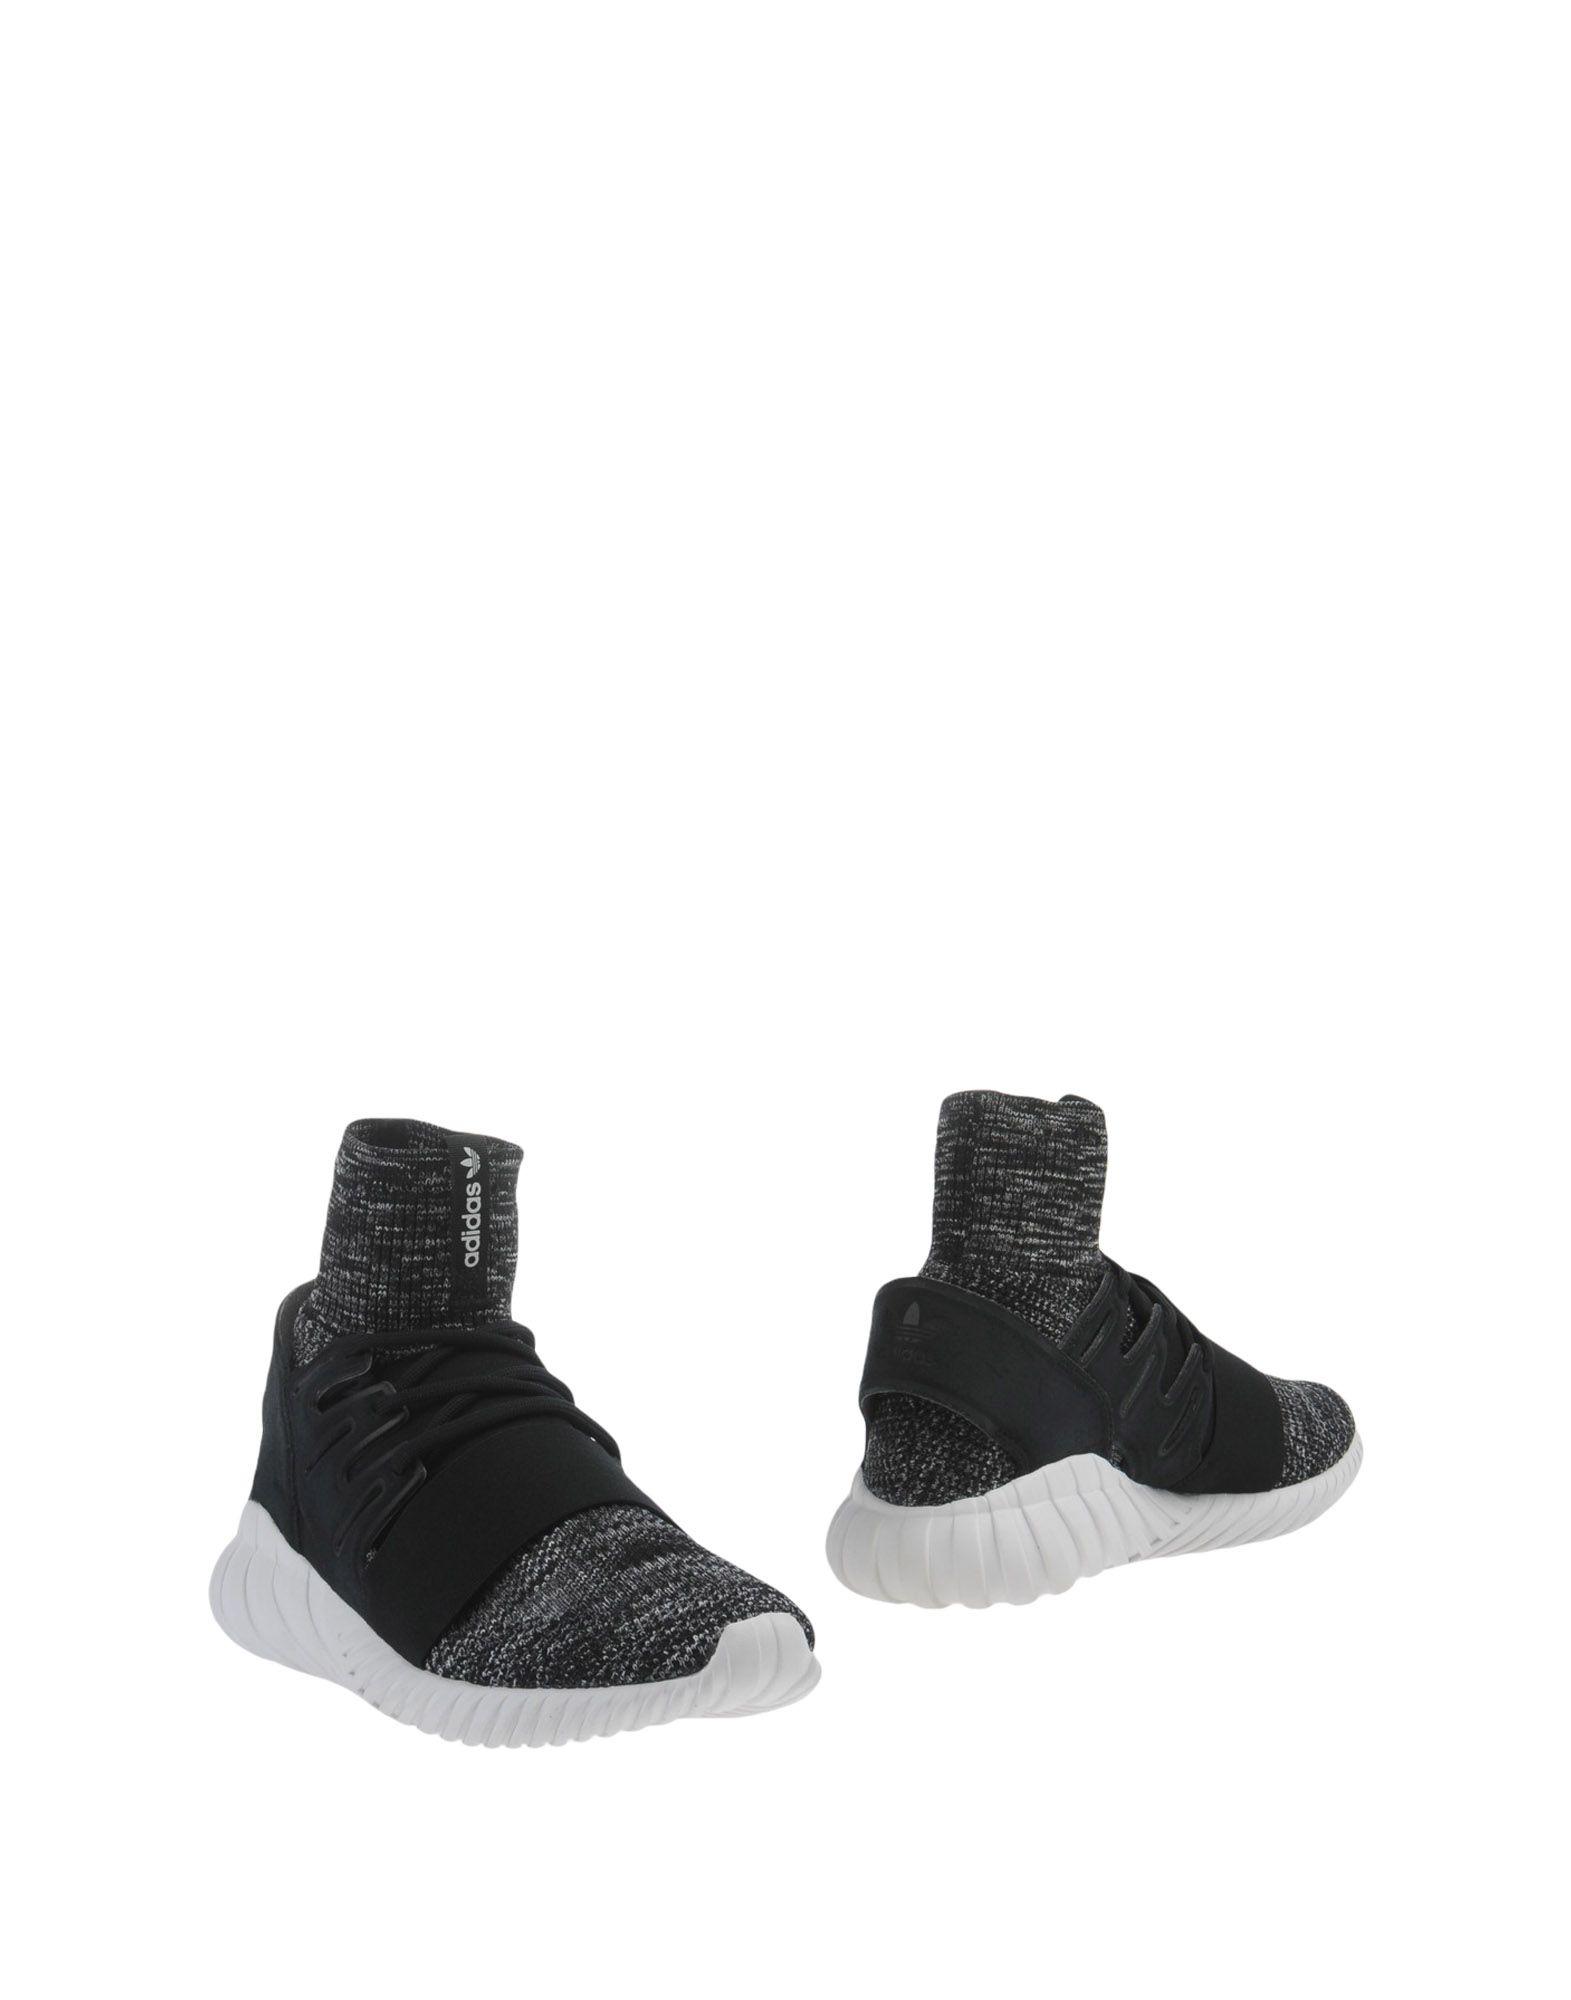 Rabatt echte Schuhe Adidas Originals Stiefelette Herren  11327561OV